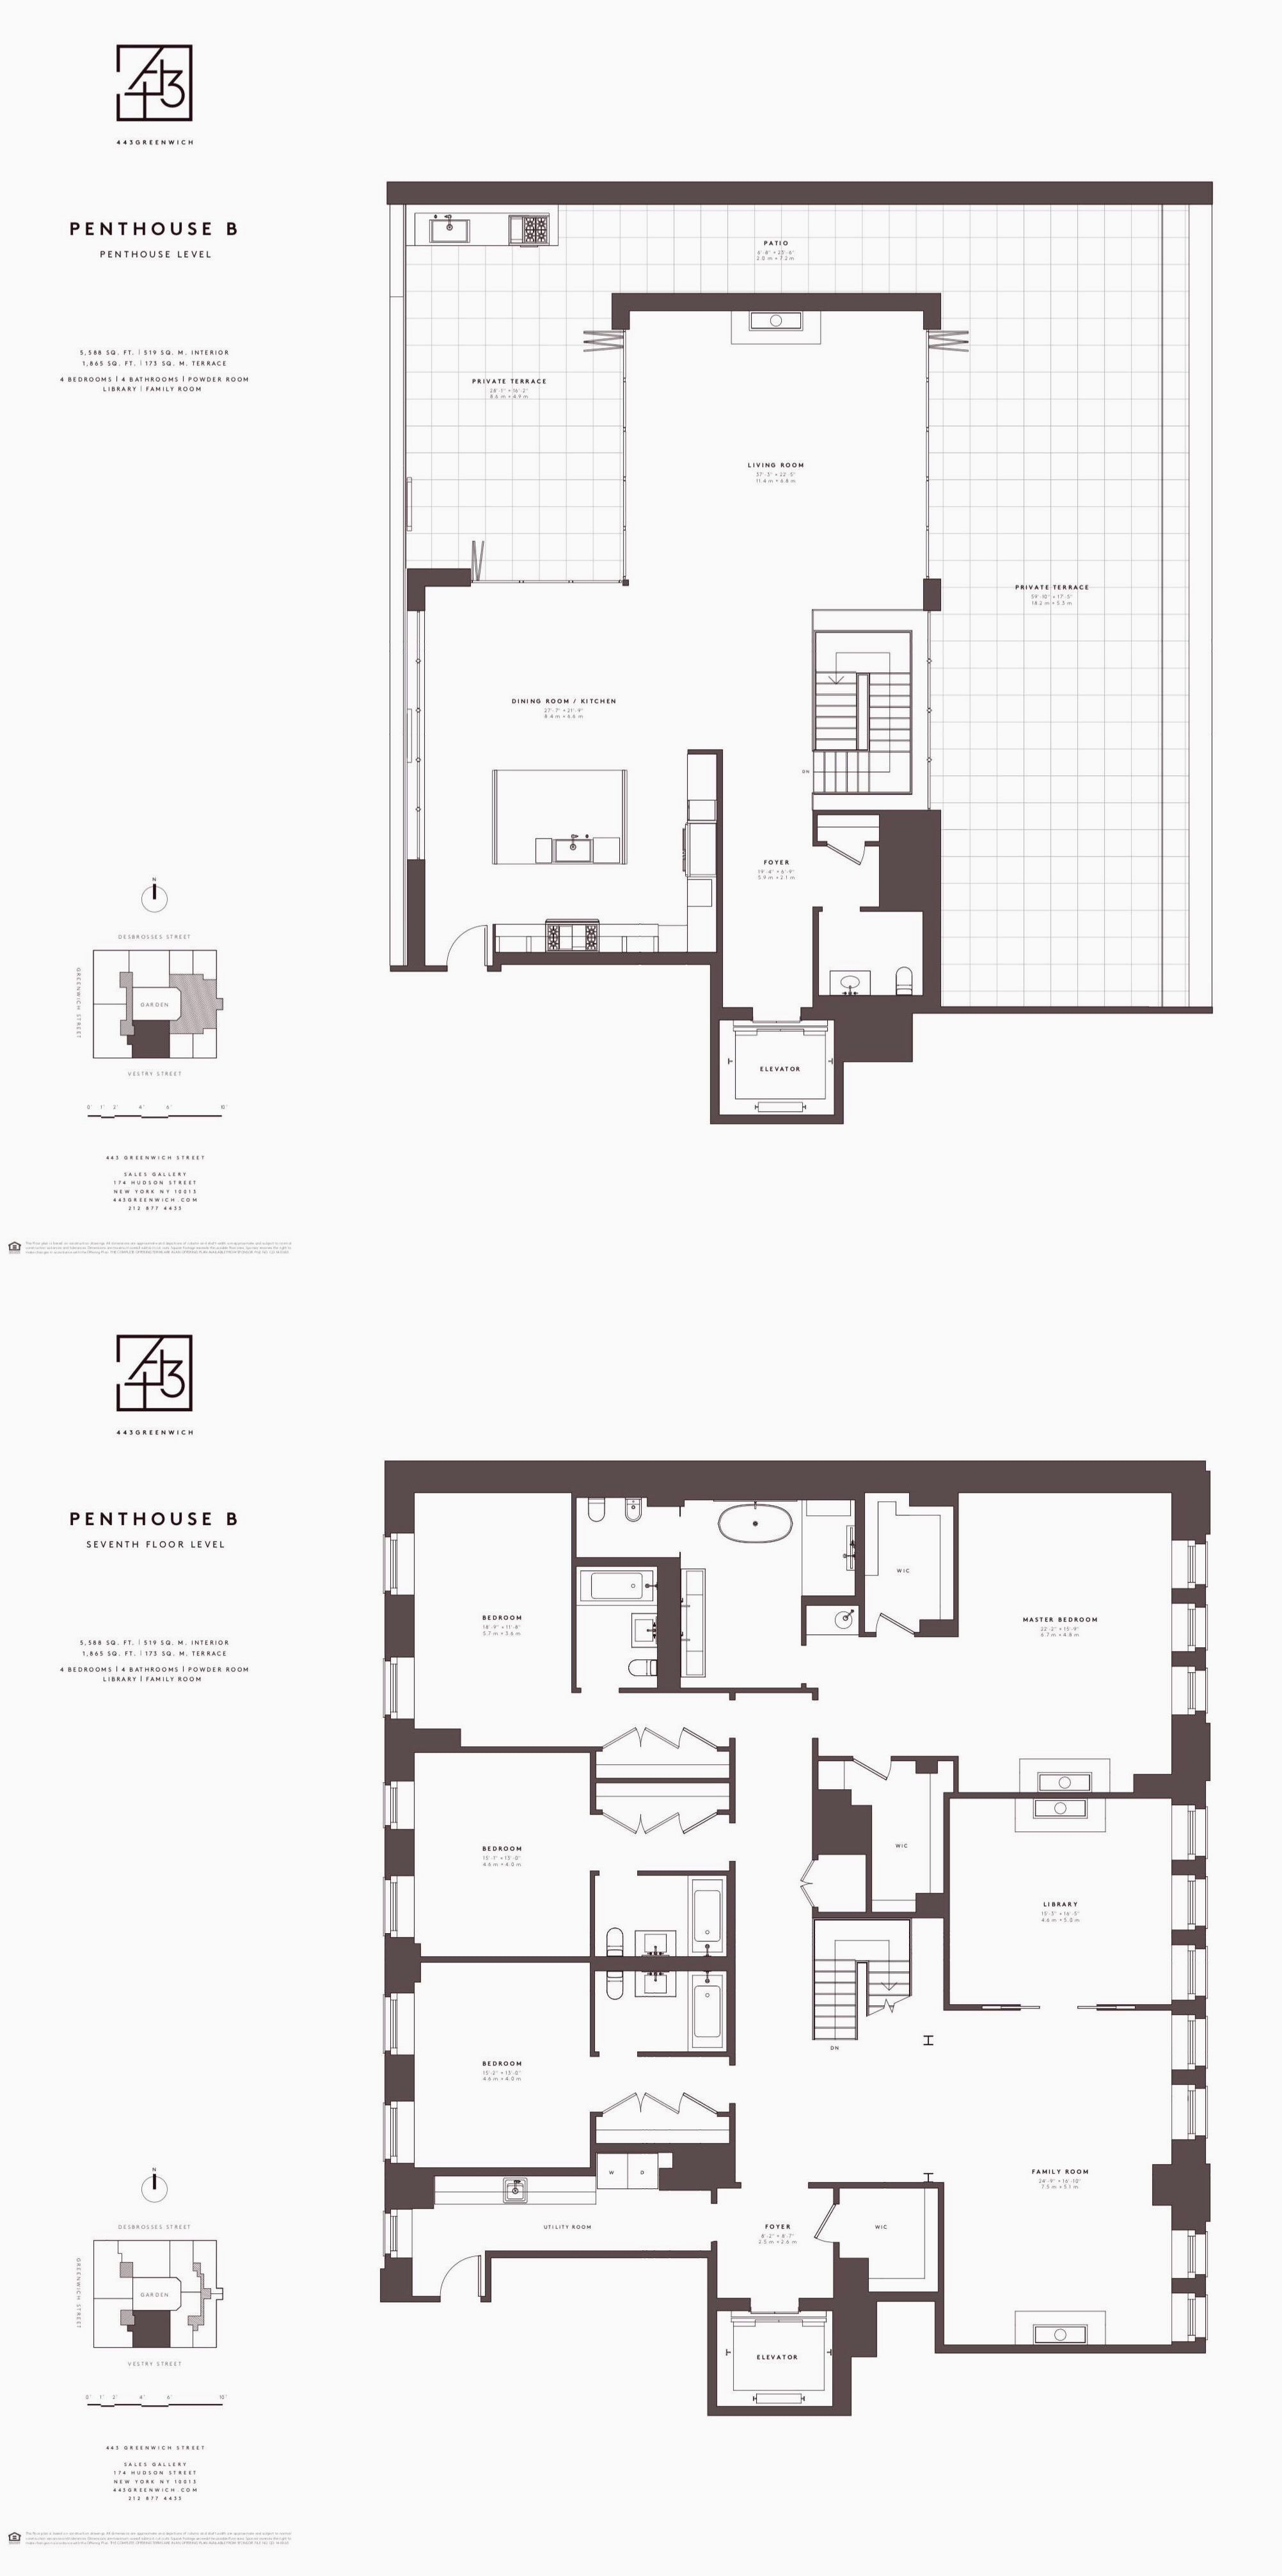 443 Greenwich Street Phb Floor Plans Condominium How To Plan